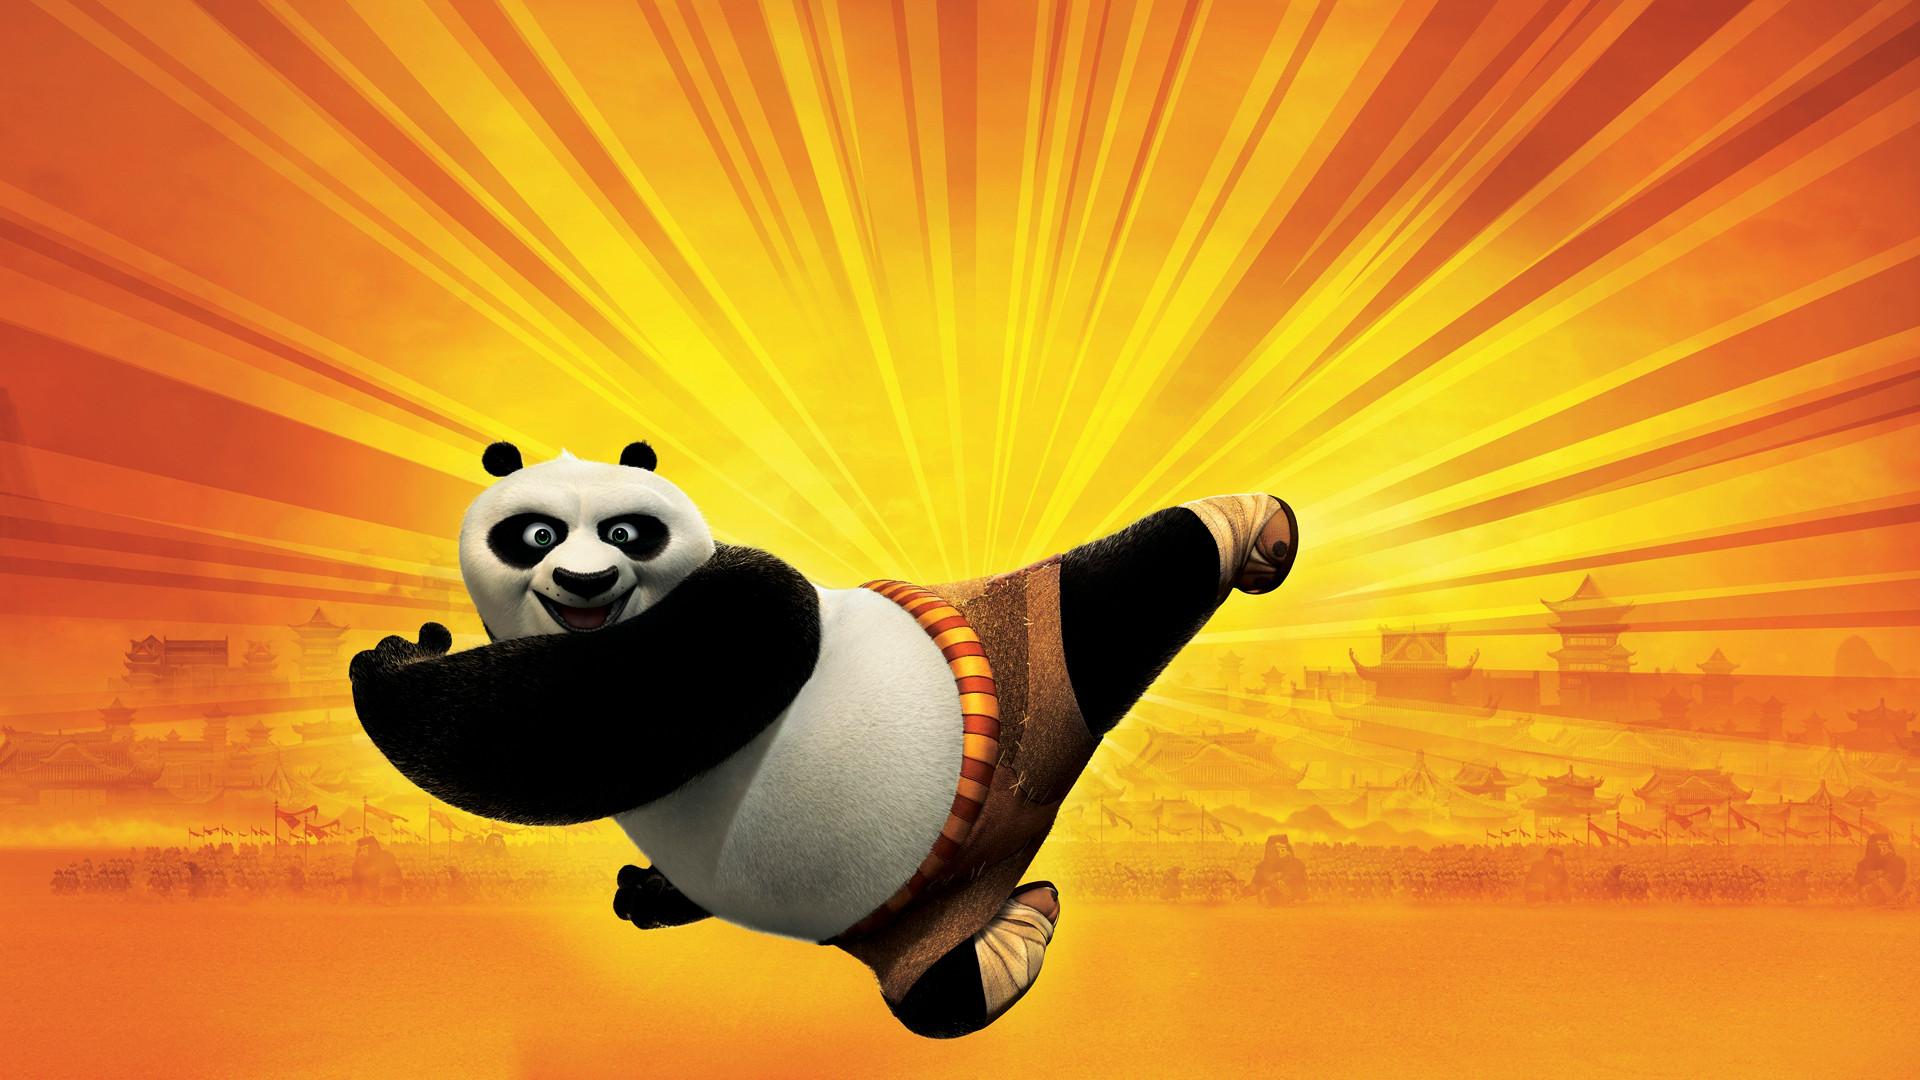 kung fu panda wallpaper 7570